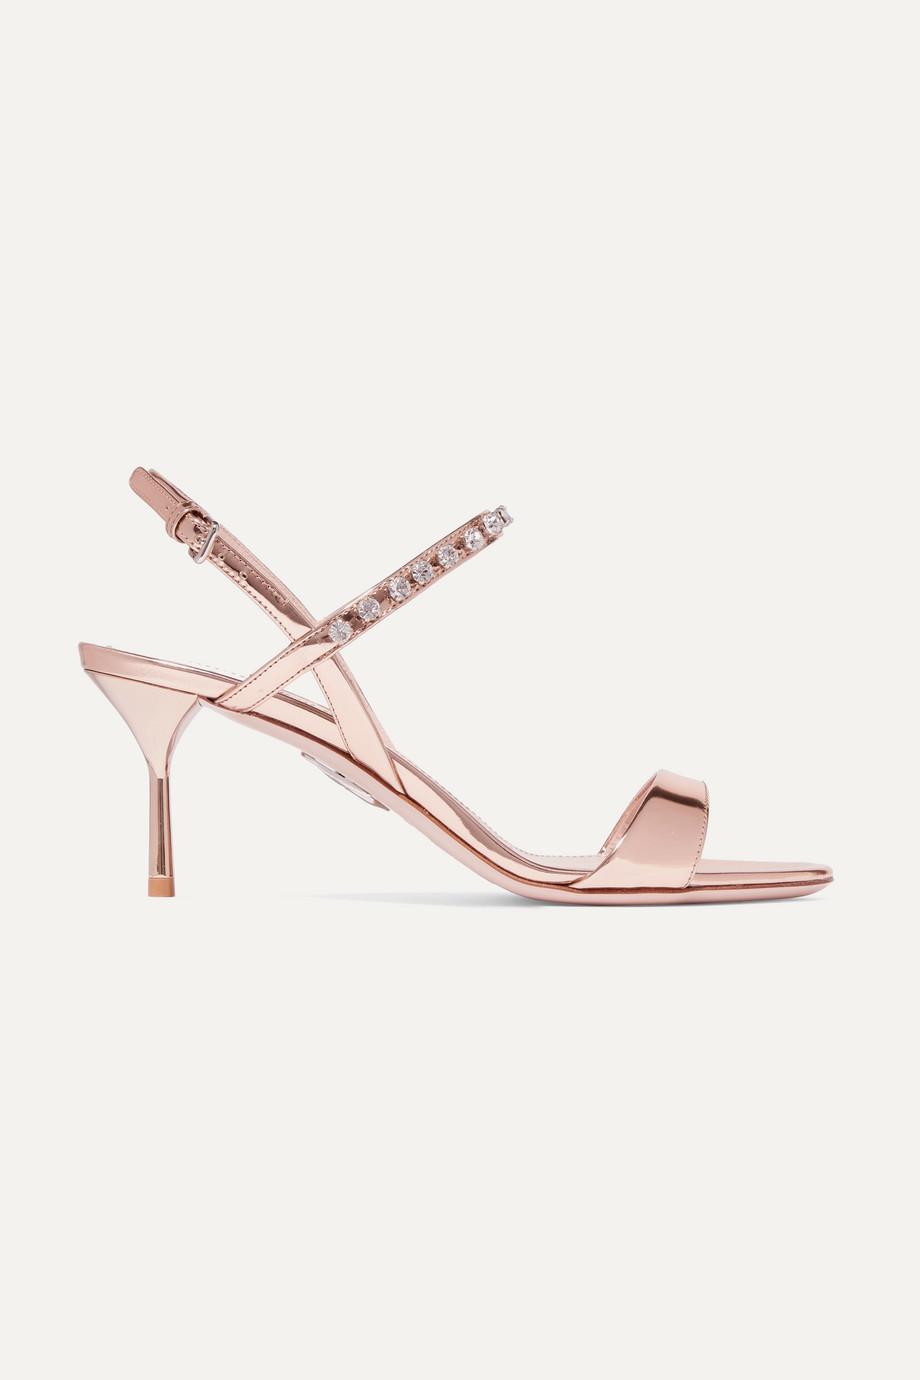 Miu Miu Slingback-Sandalen aus Metallic-Lackleder mit Kristallen